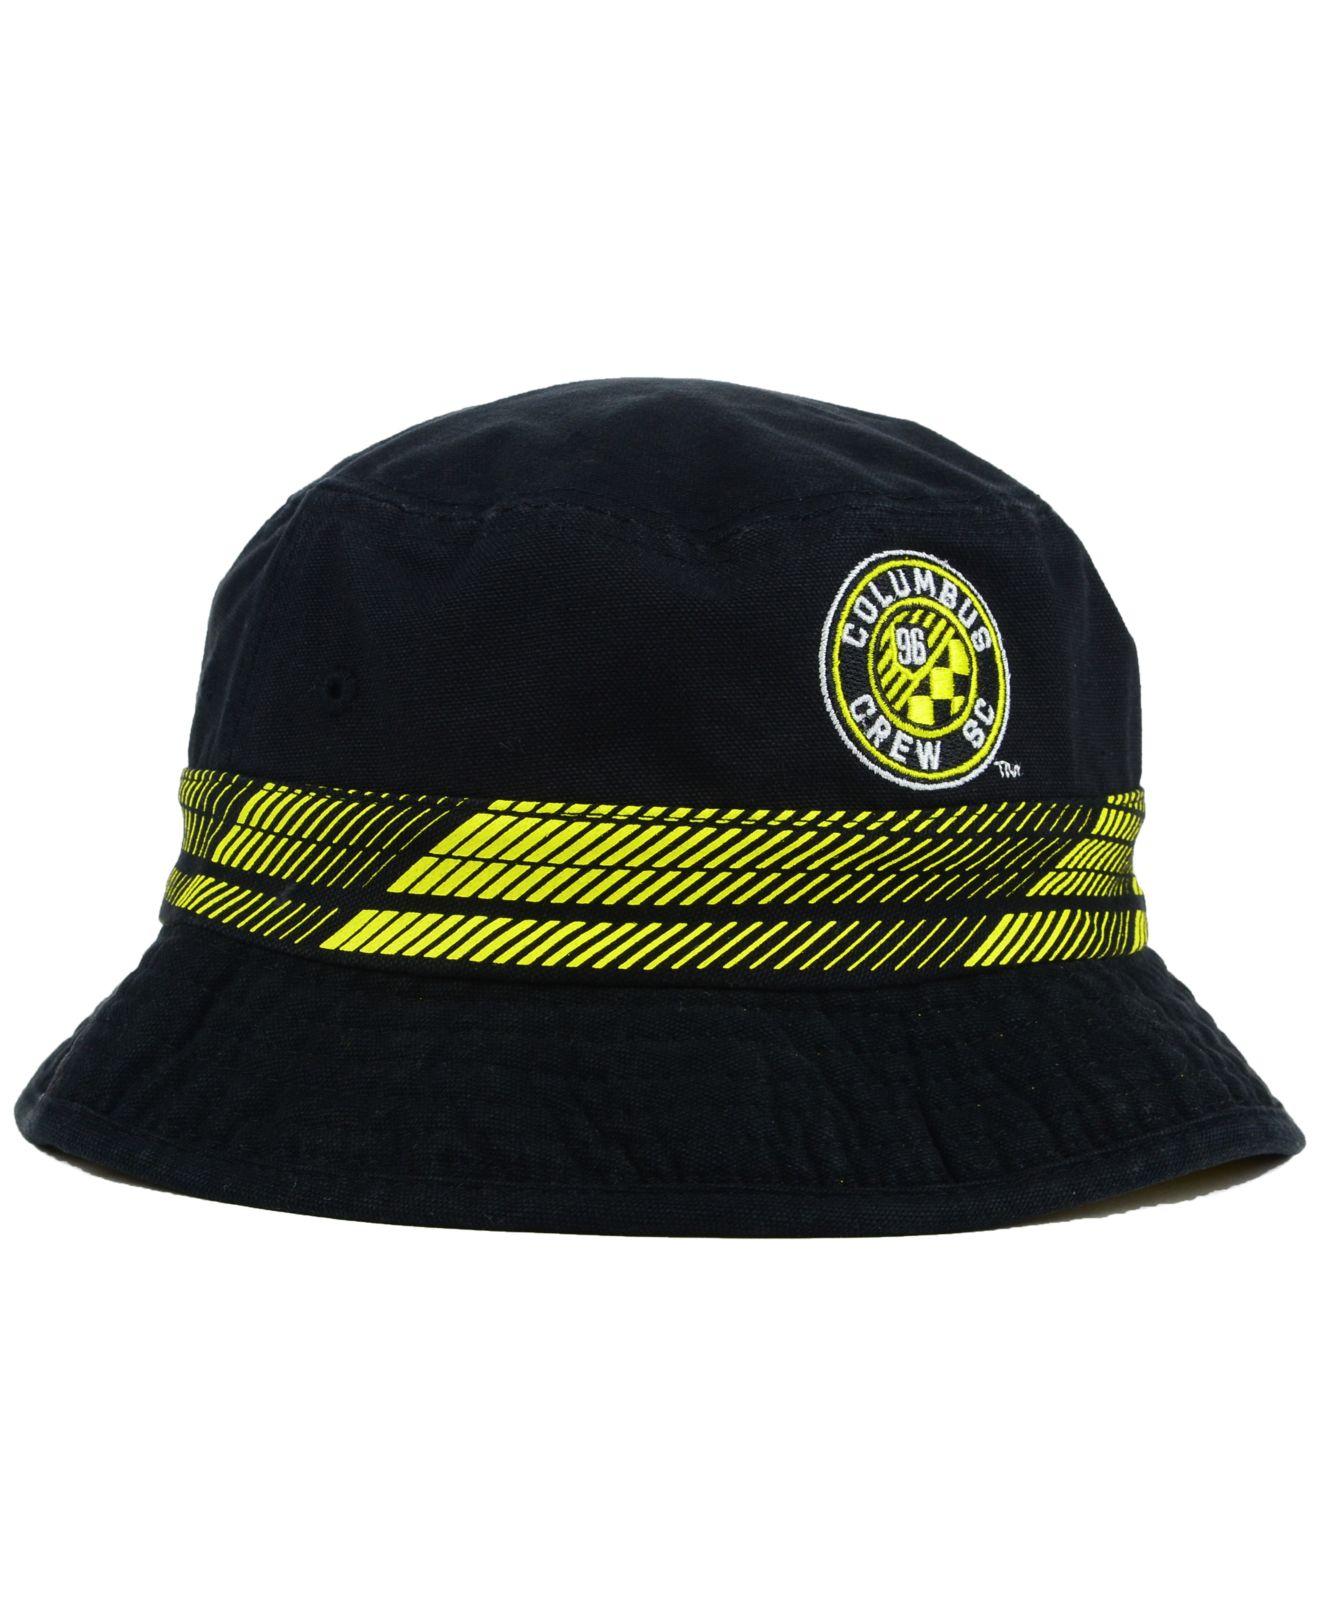 f5bd0cad89a5d ... switzerland lyst adidas columbus crew evolution bucket hat in yellow f  fashion styles c53bf 33a0c 2c4fa